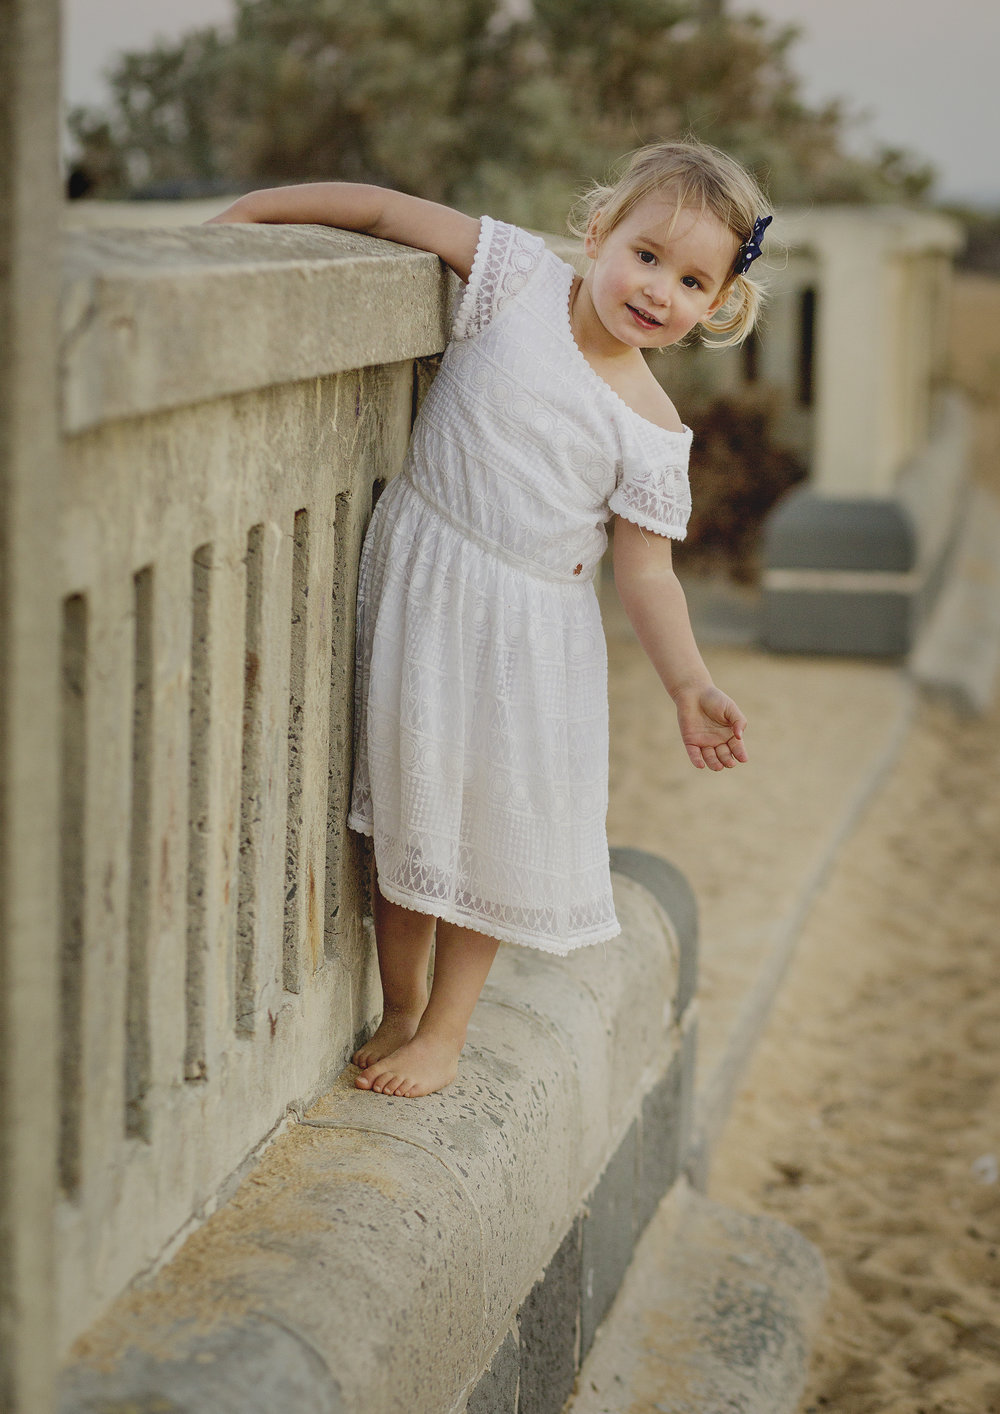 Bayside Child Photos Melbourne